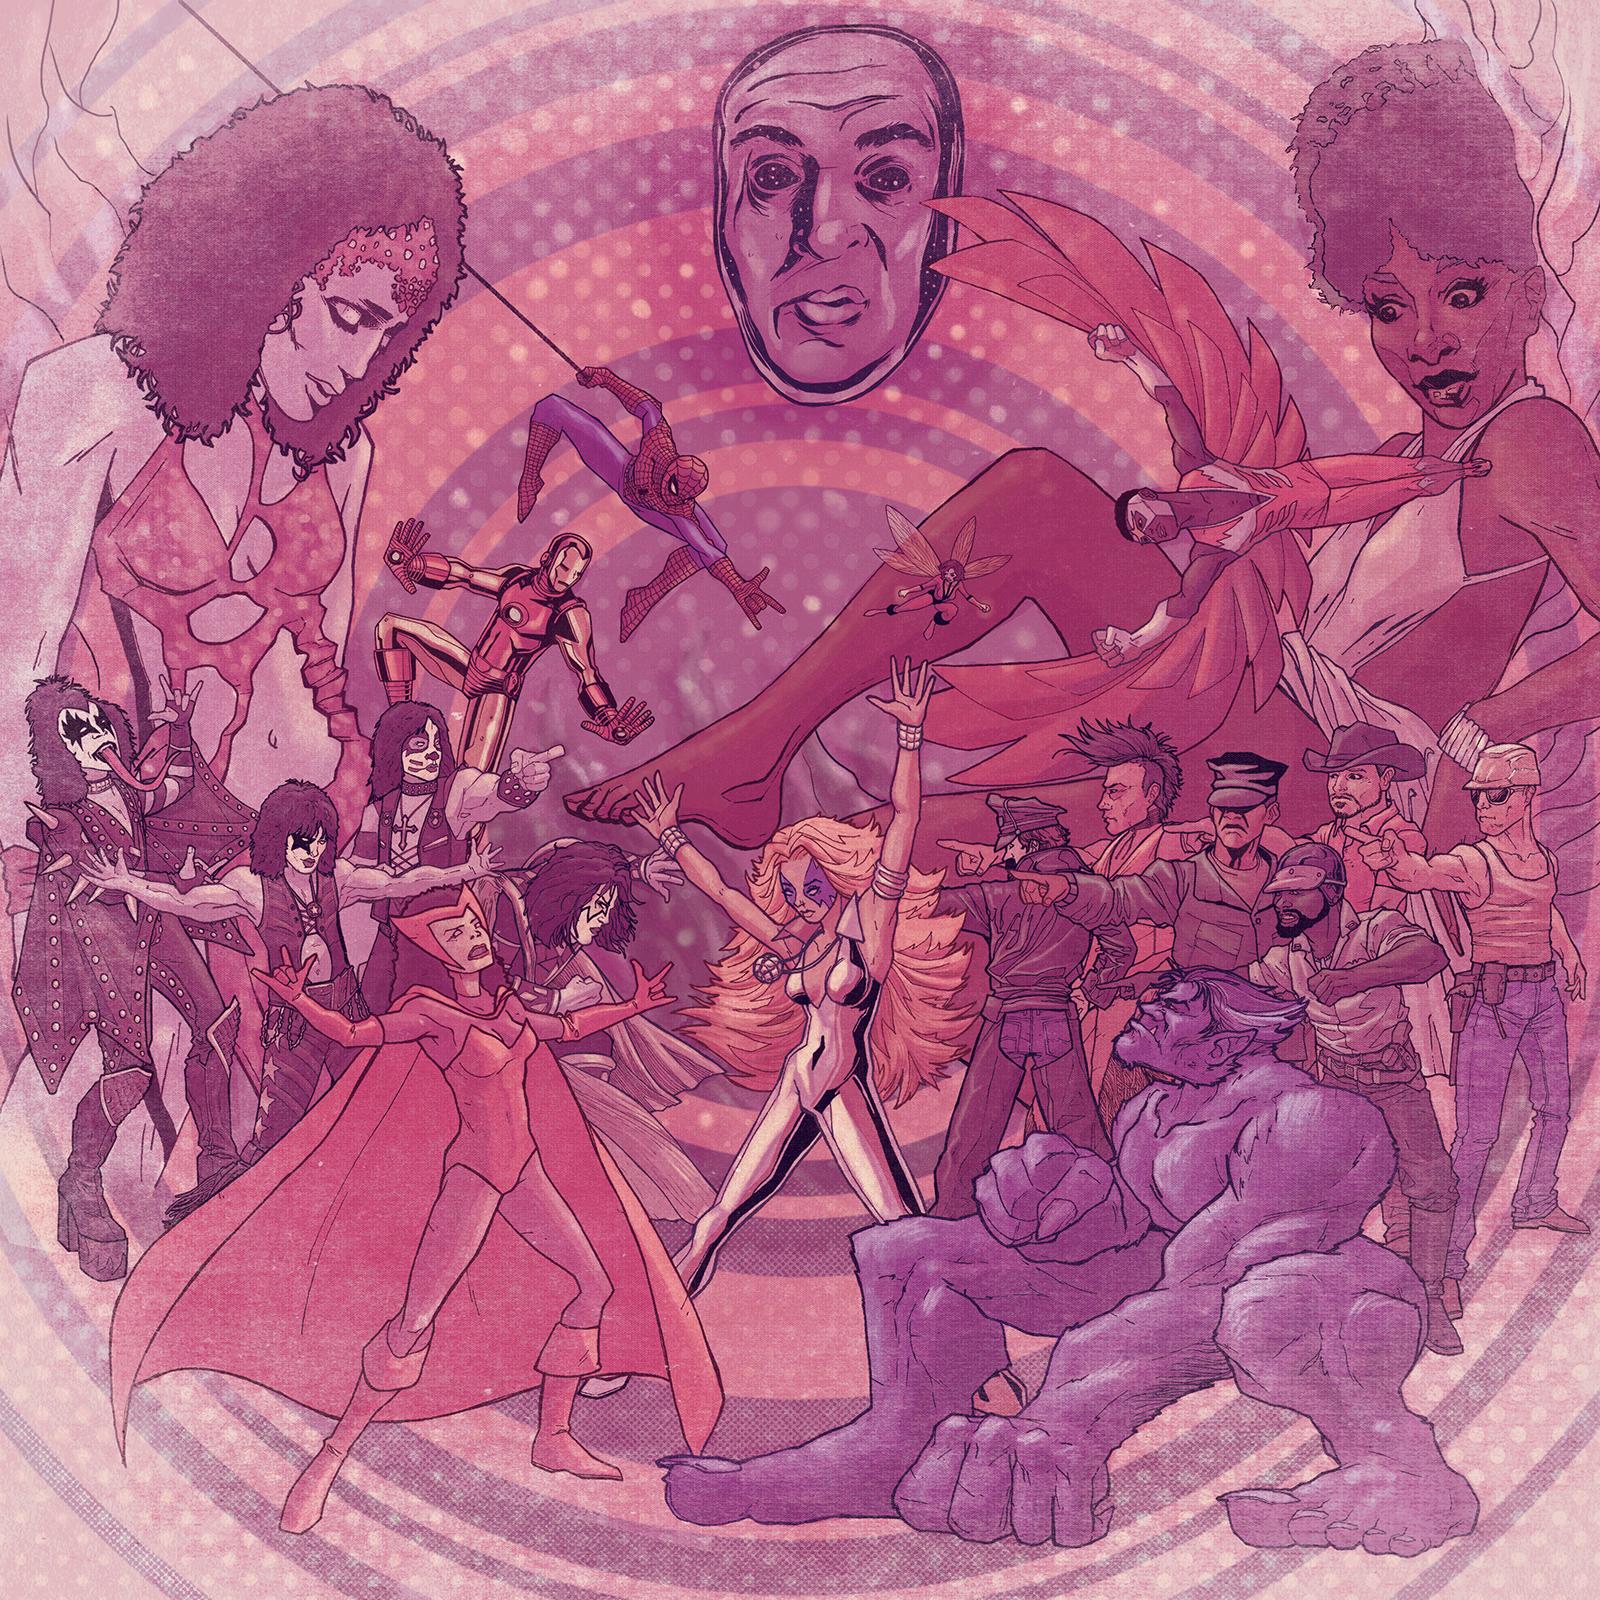 Illustration by Keith Einmann